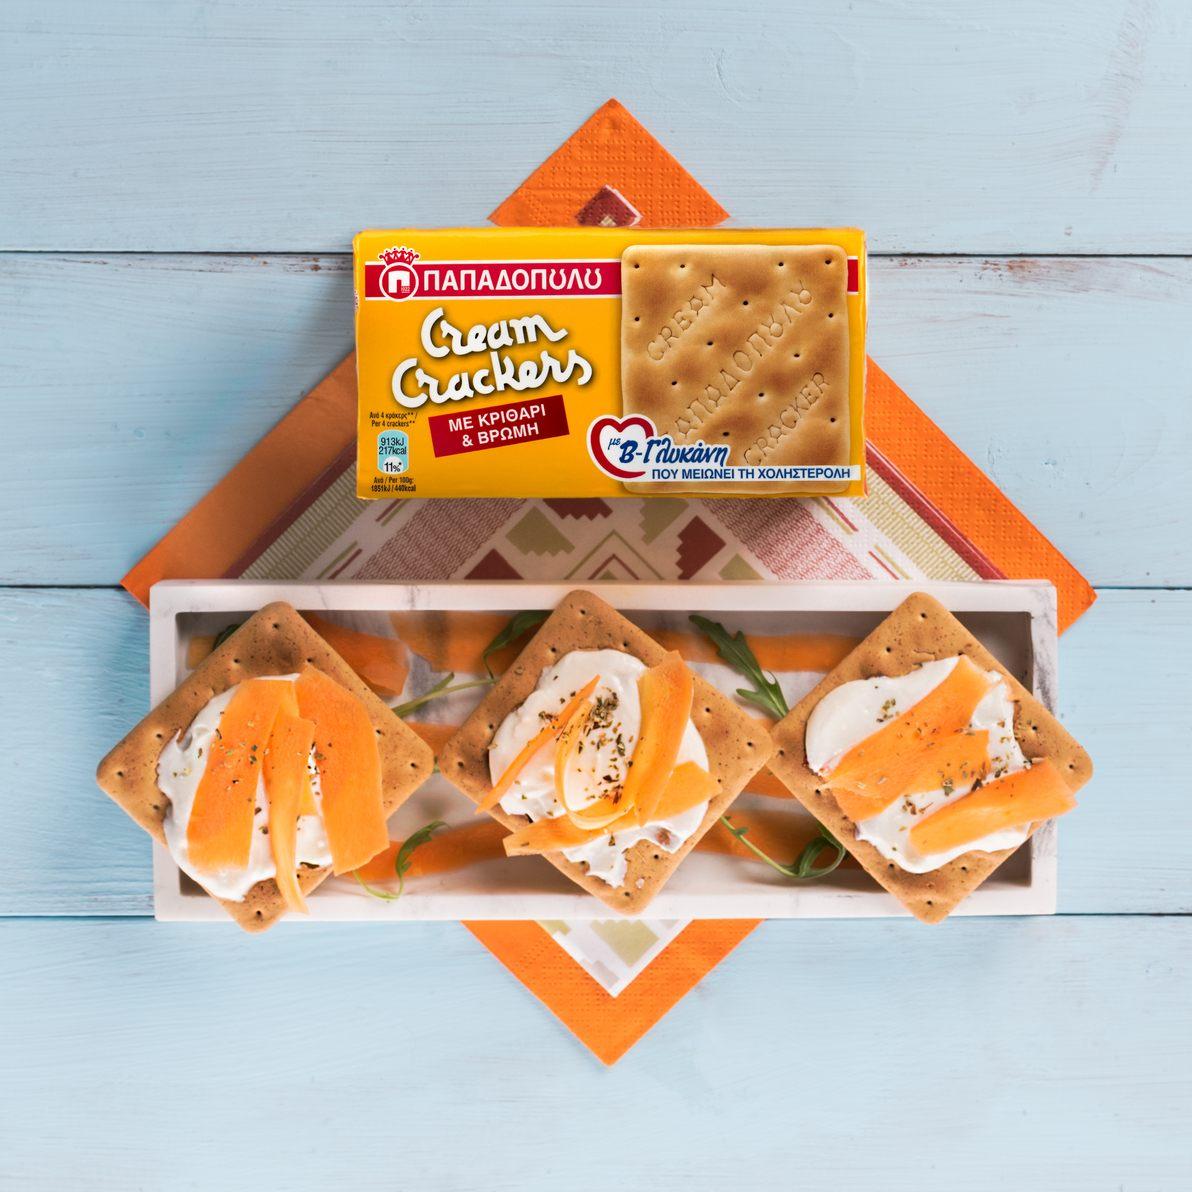 Featured image for Υγιεινό γεύμα με Cream Crackers με κριθάρι, βρώμη & Β'–γλυκάνη, κατίκι και καρότο